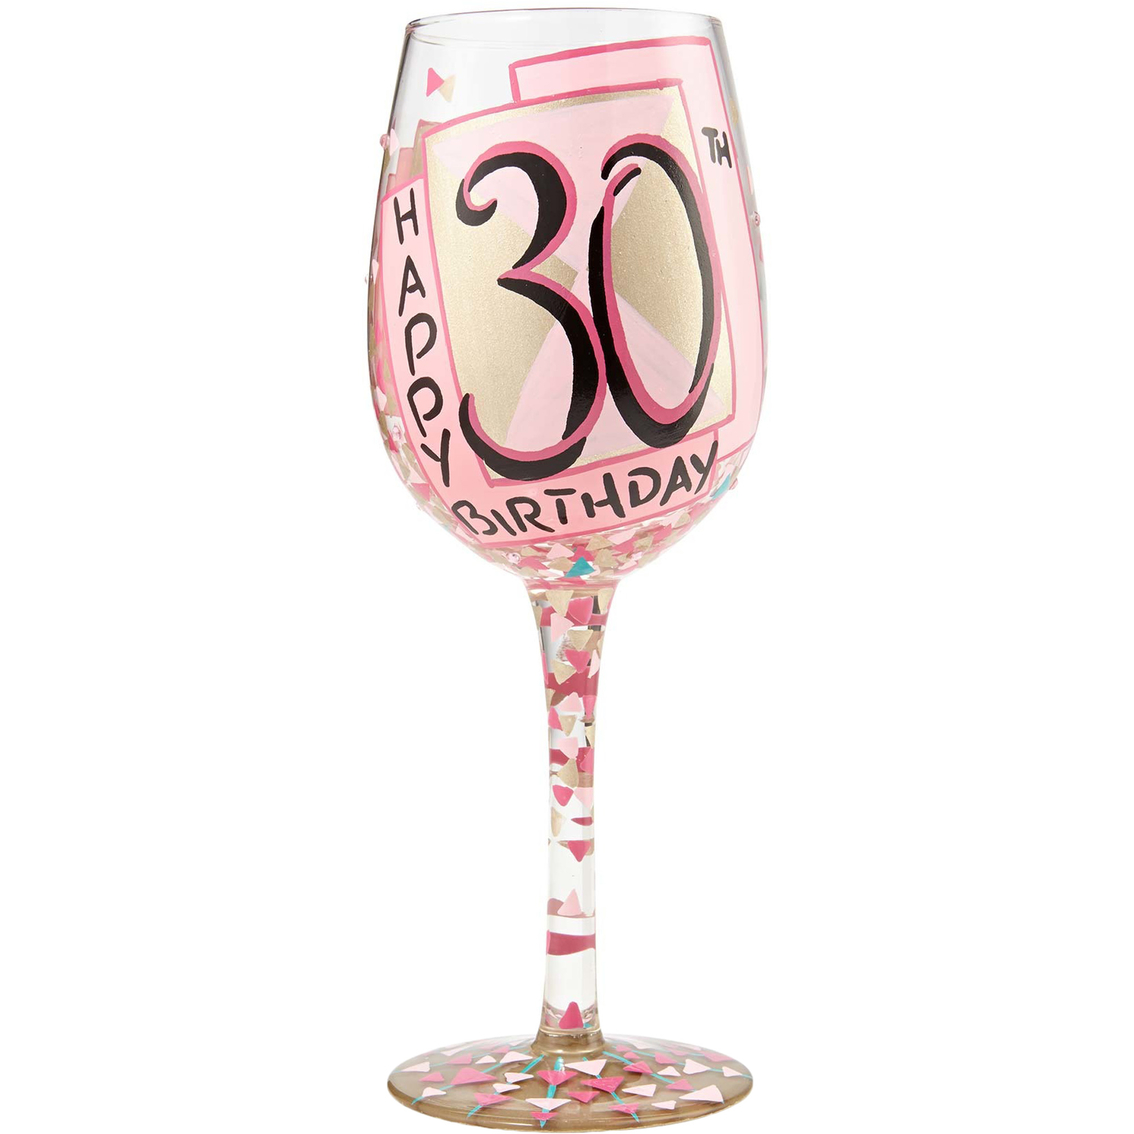 Lolita 30th Birthday Wine Glass | Beer, Bar & Wine Glasses | Household